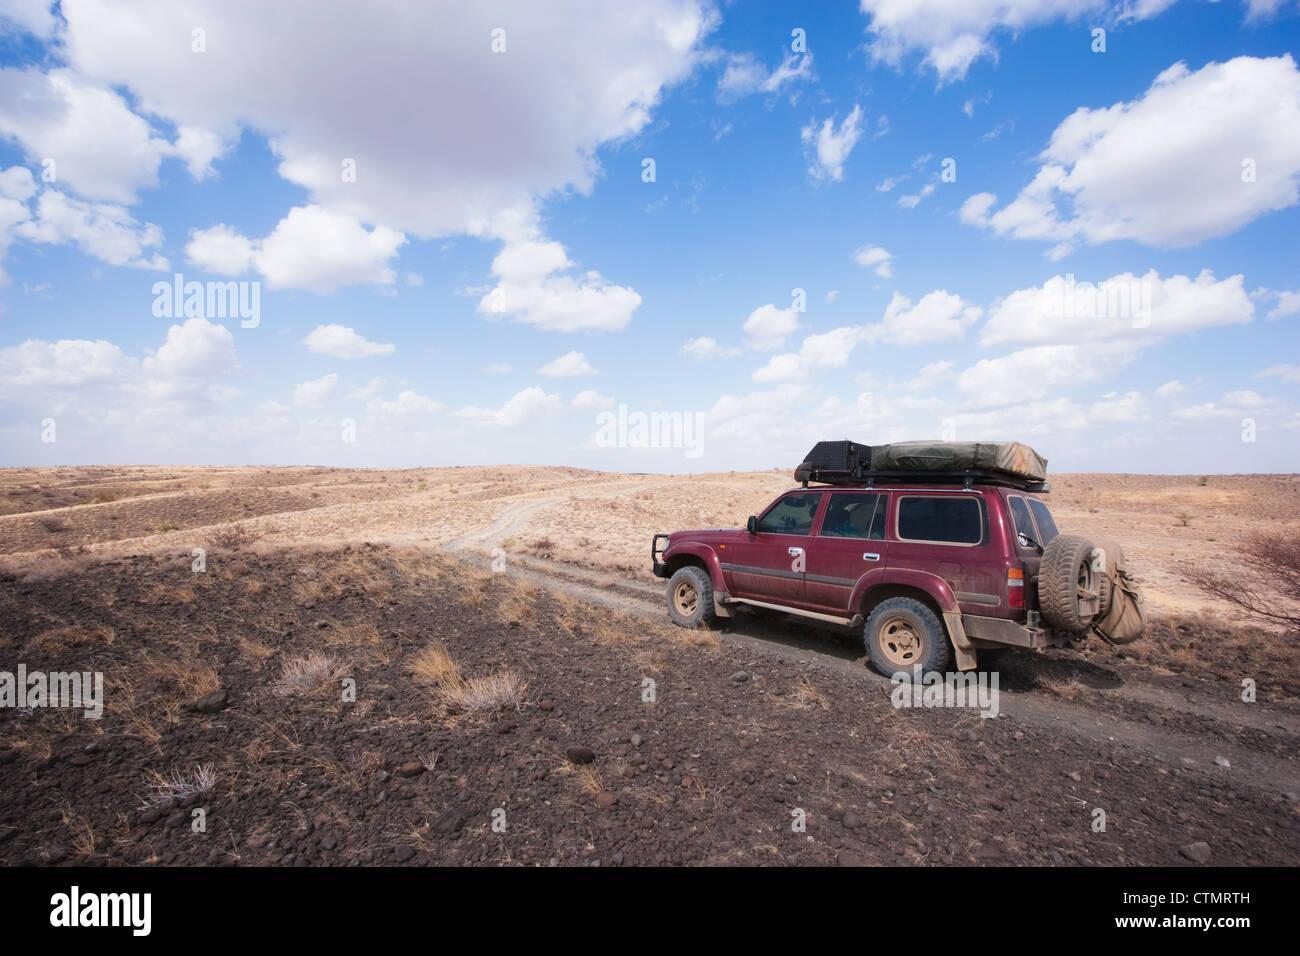 Four-Wheel drive on volcanic rocks in desert, Loyongalani region, Lake Turkana, Kenya Stock Photo